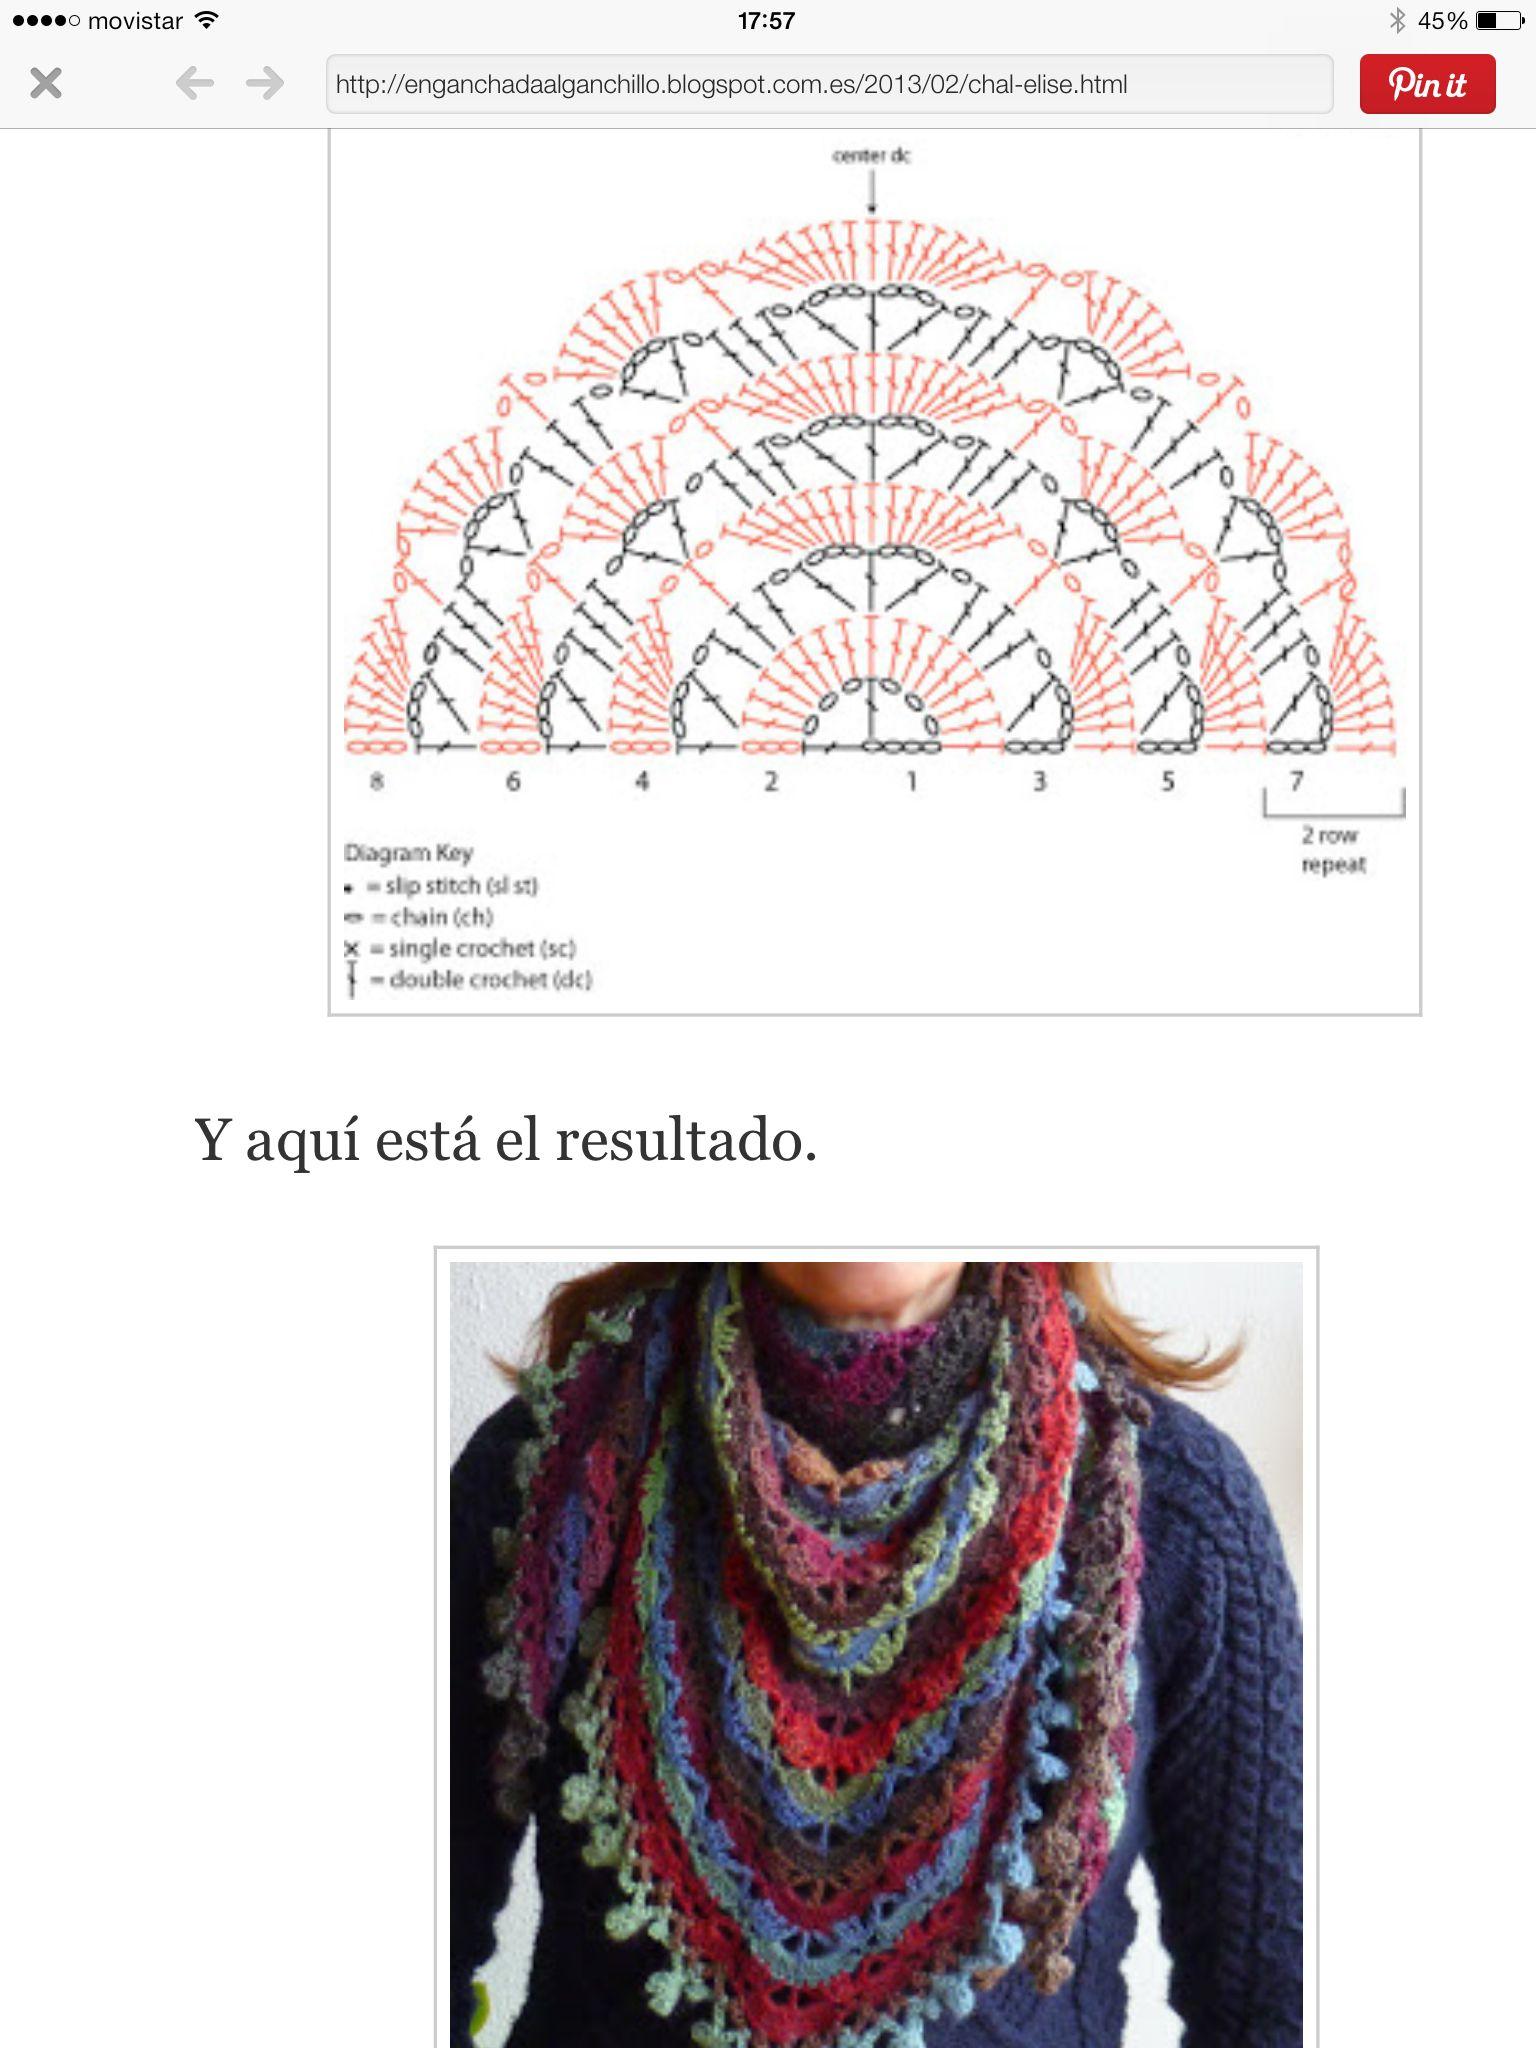 Pañuelo/chal/triangulo crochet | Crochet: Cowls, shawls, wraps ...